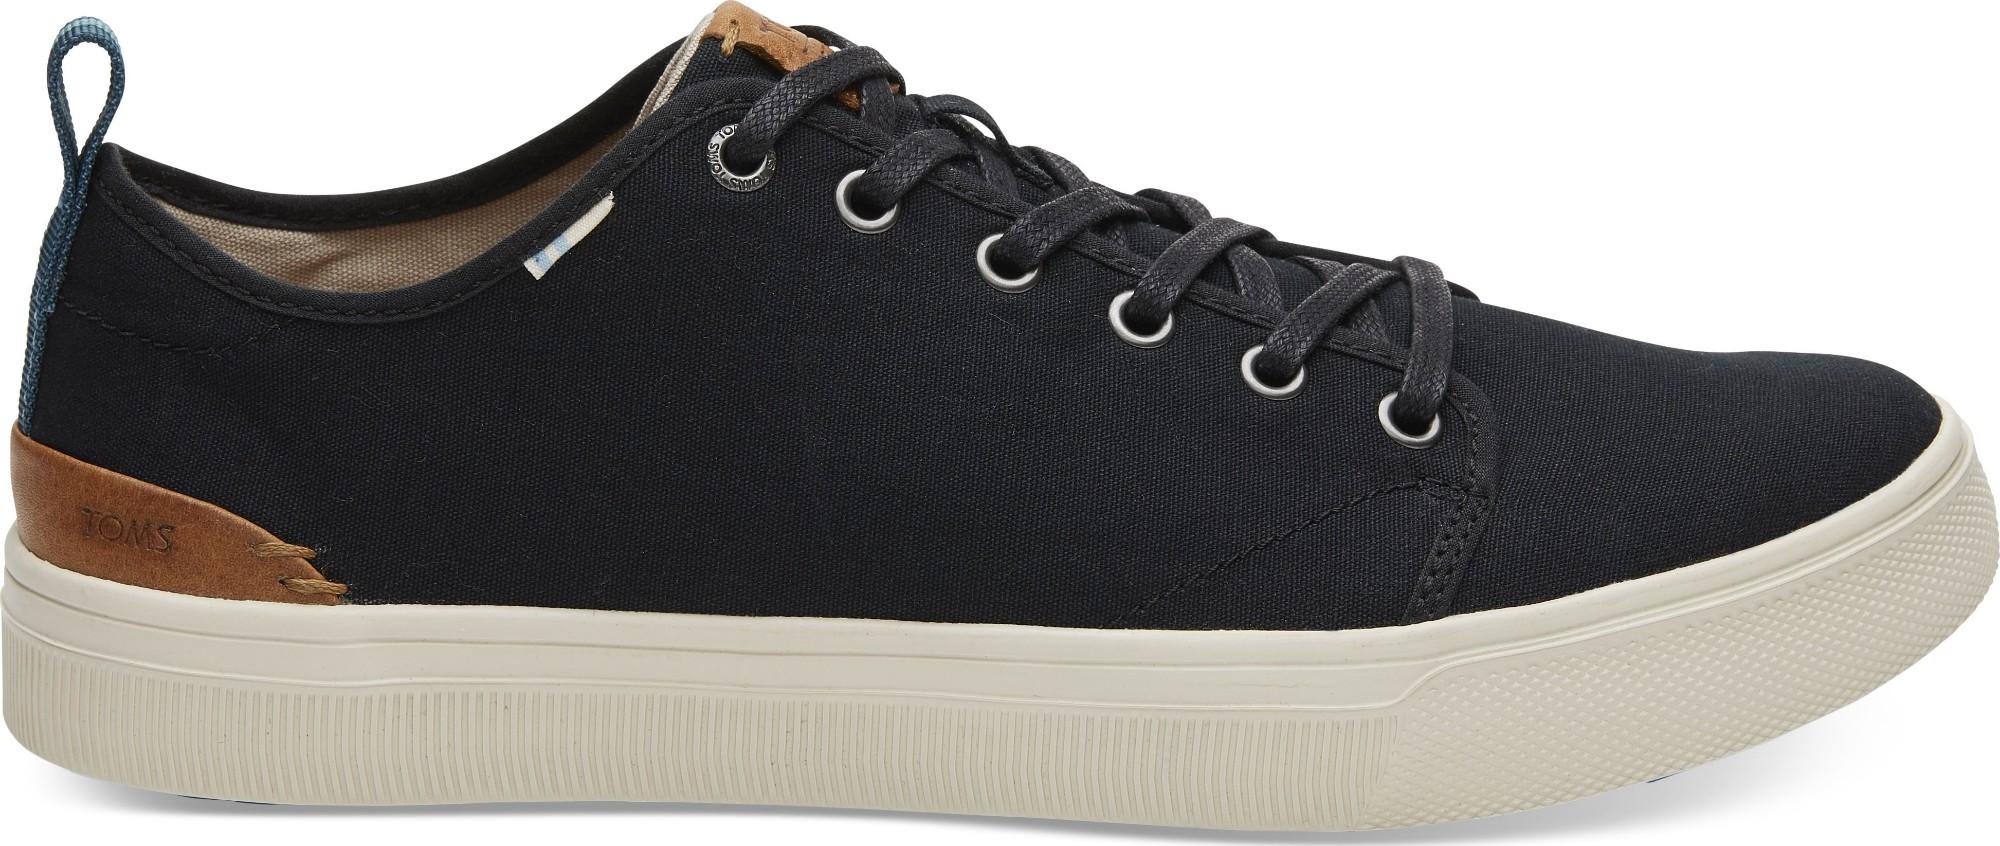 TOMS Canvas Men's Trvl Lite Low Sneaker Black 41